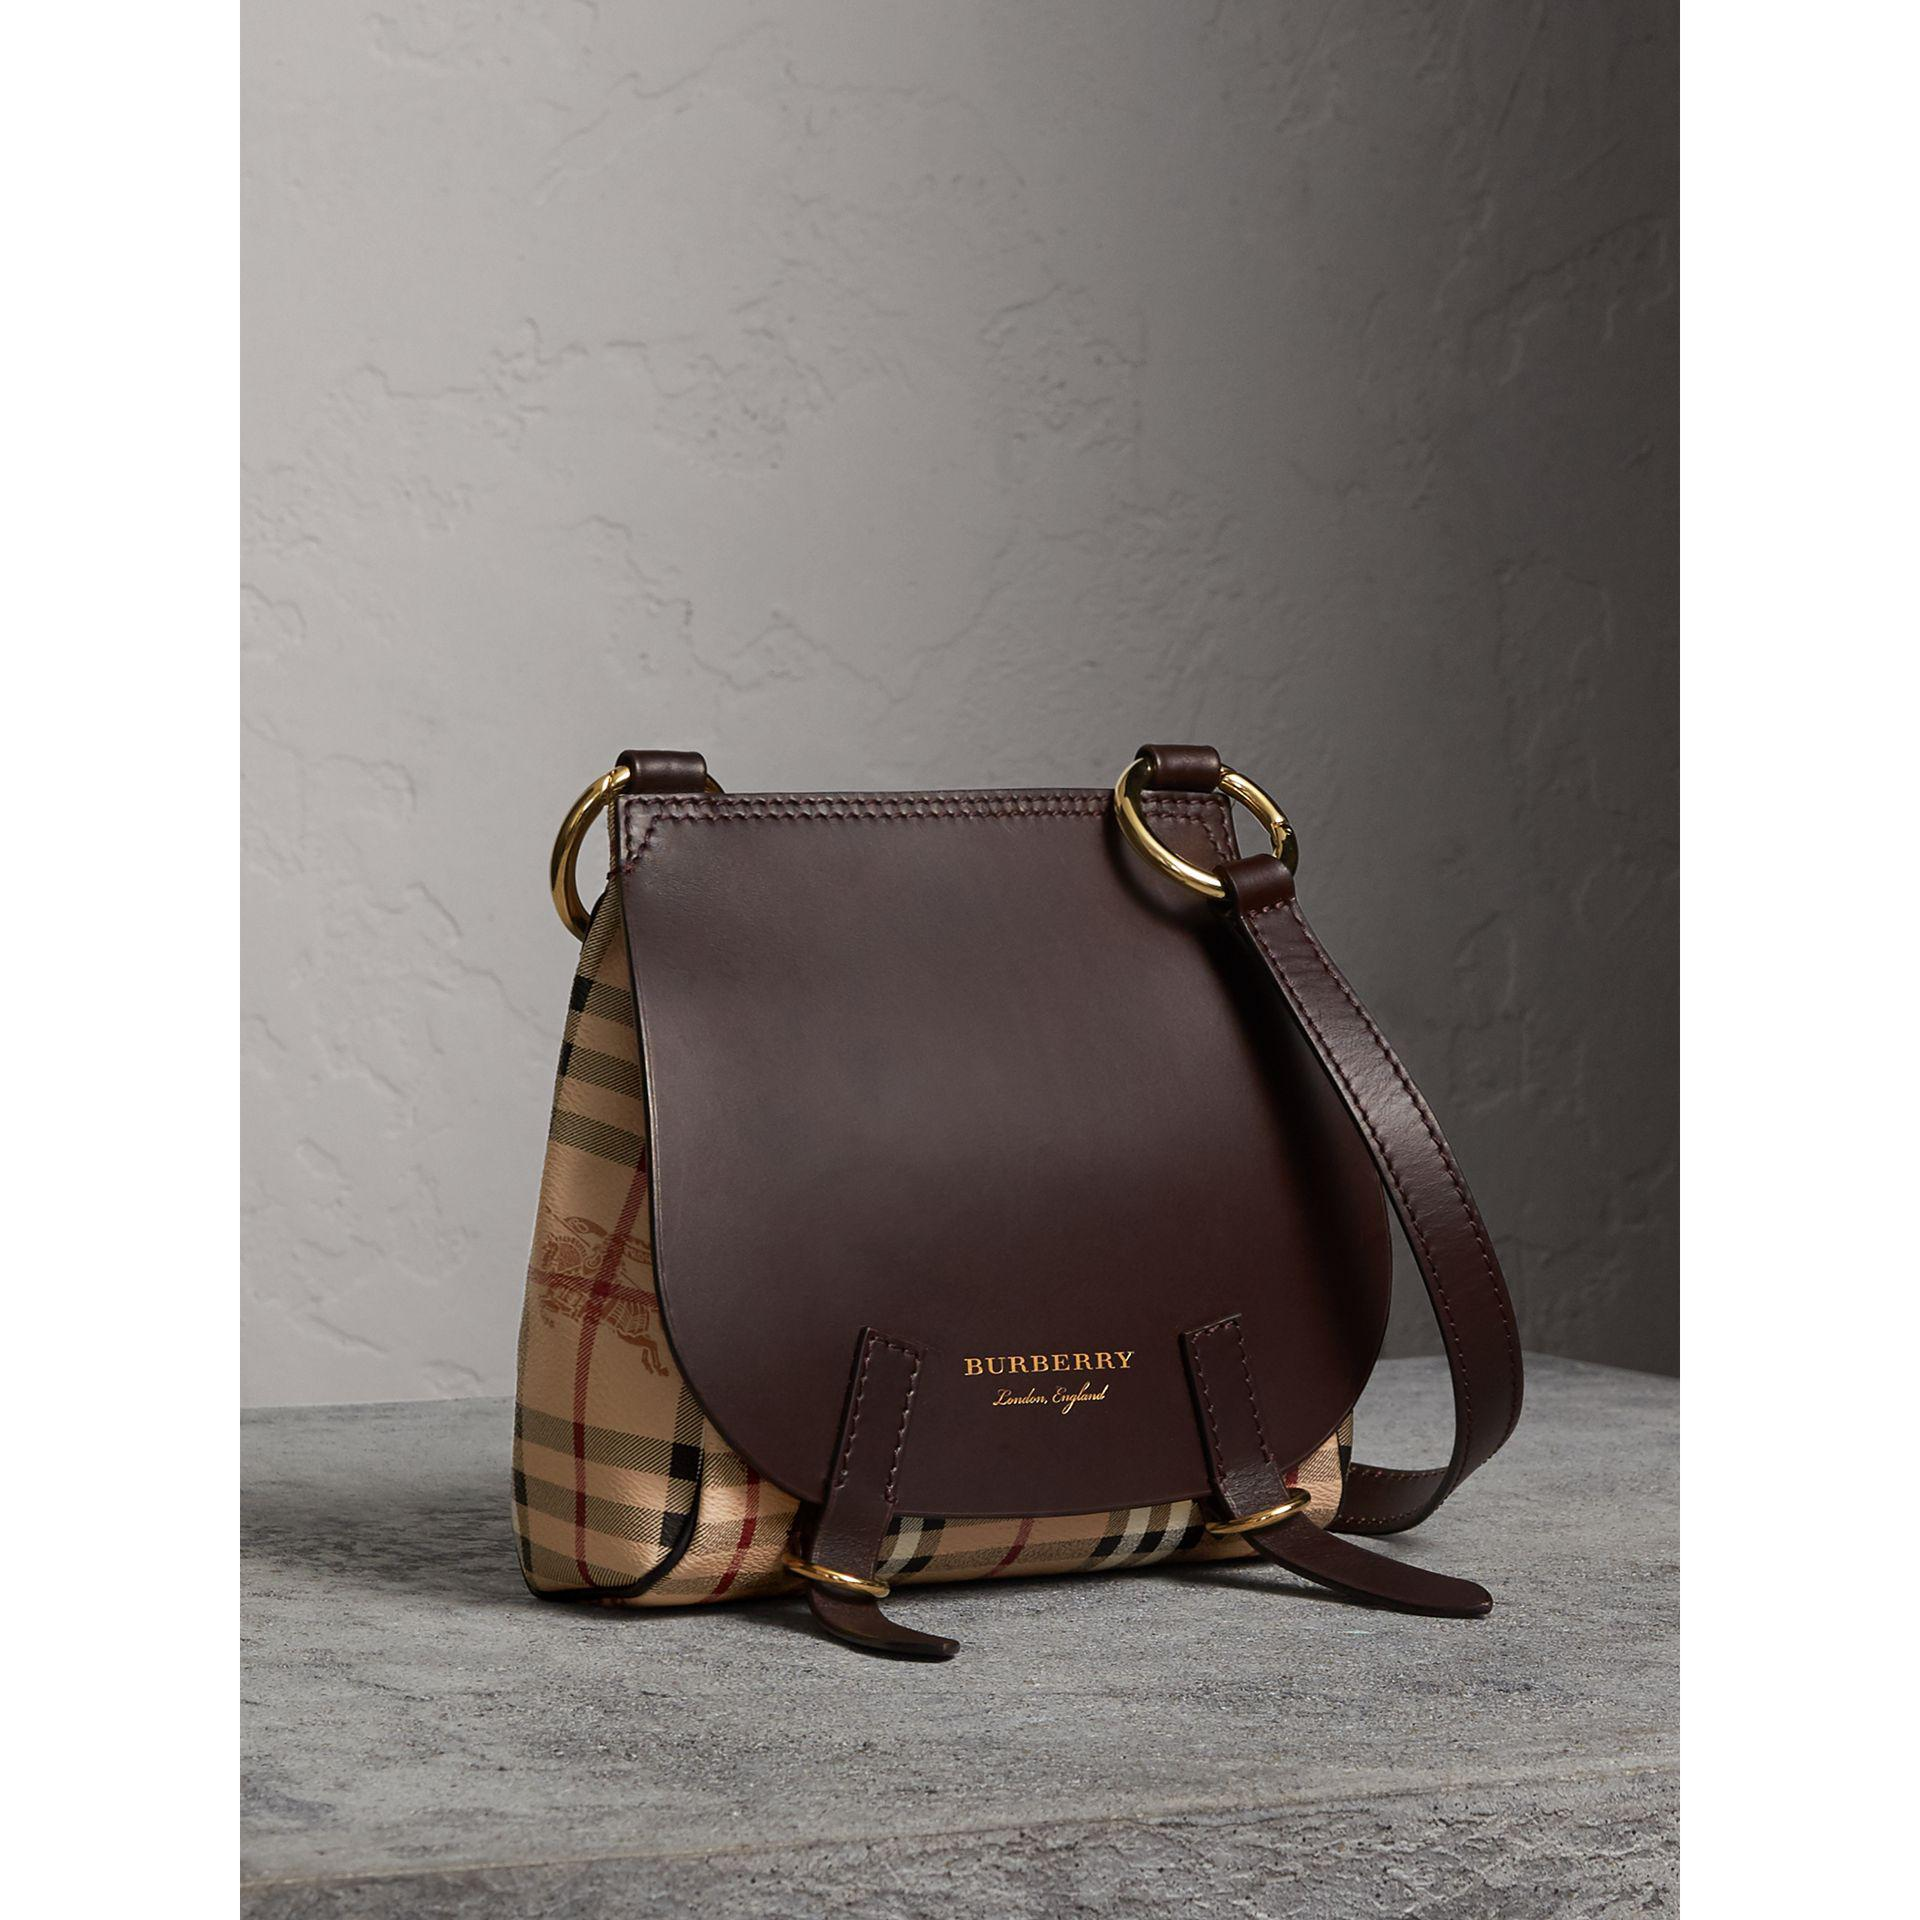 b9c628889d11 Lyst - Burberry The Bridle Crossbody Bag In Haymarket Check - Women ...